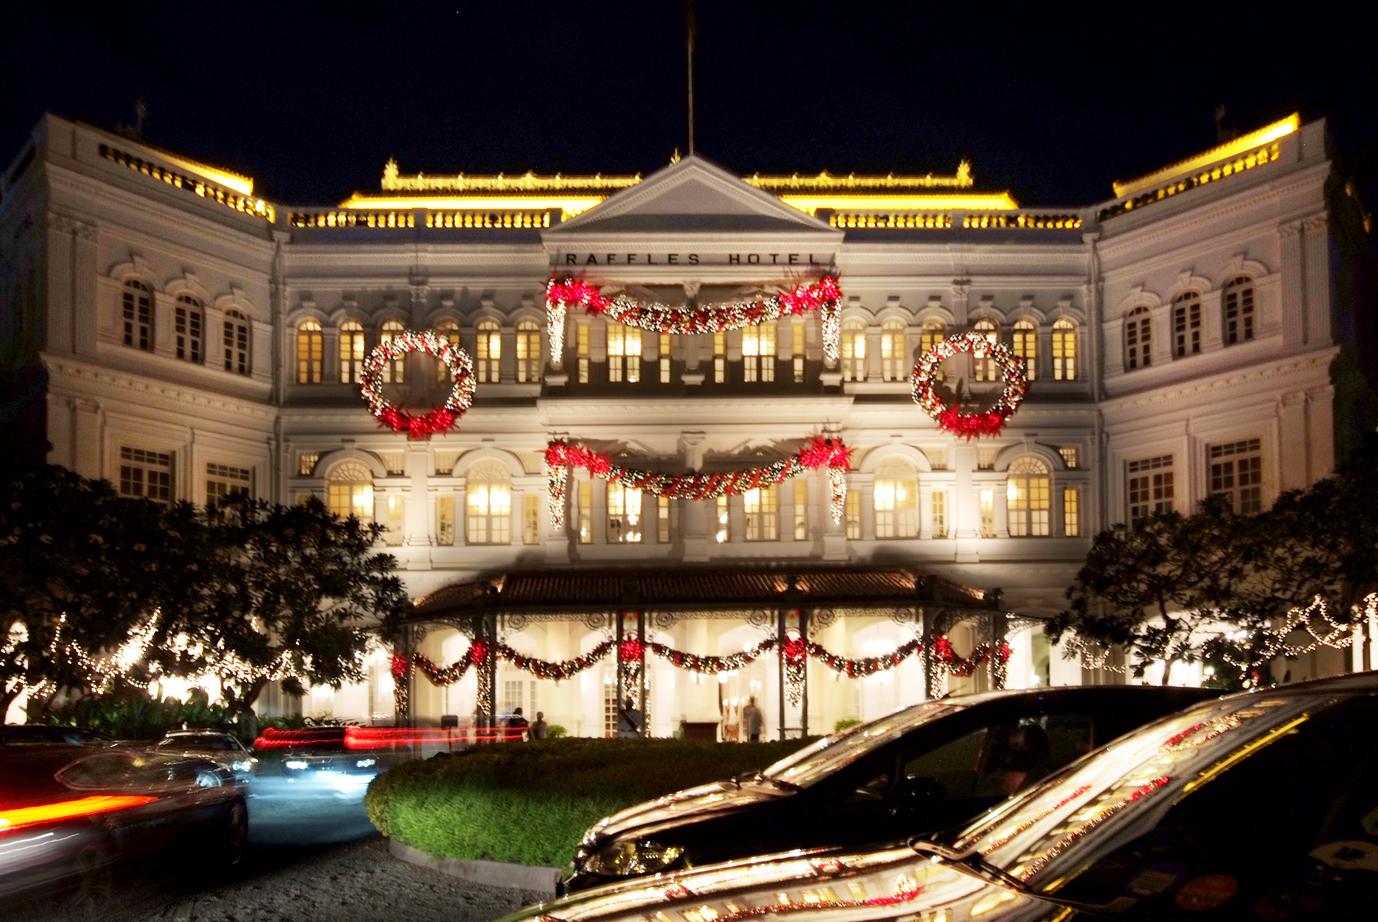 https://upload.wikimedia.org/wikipedia/commons/4/4a/Raffles_Hotel_%E2%80%93_Singapore_(4142238787).jpg